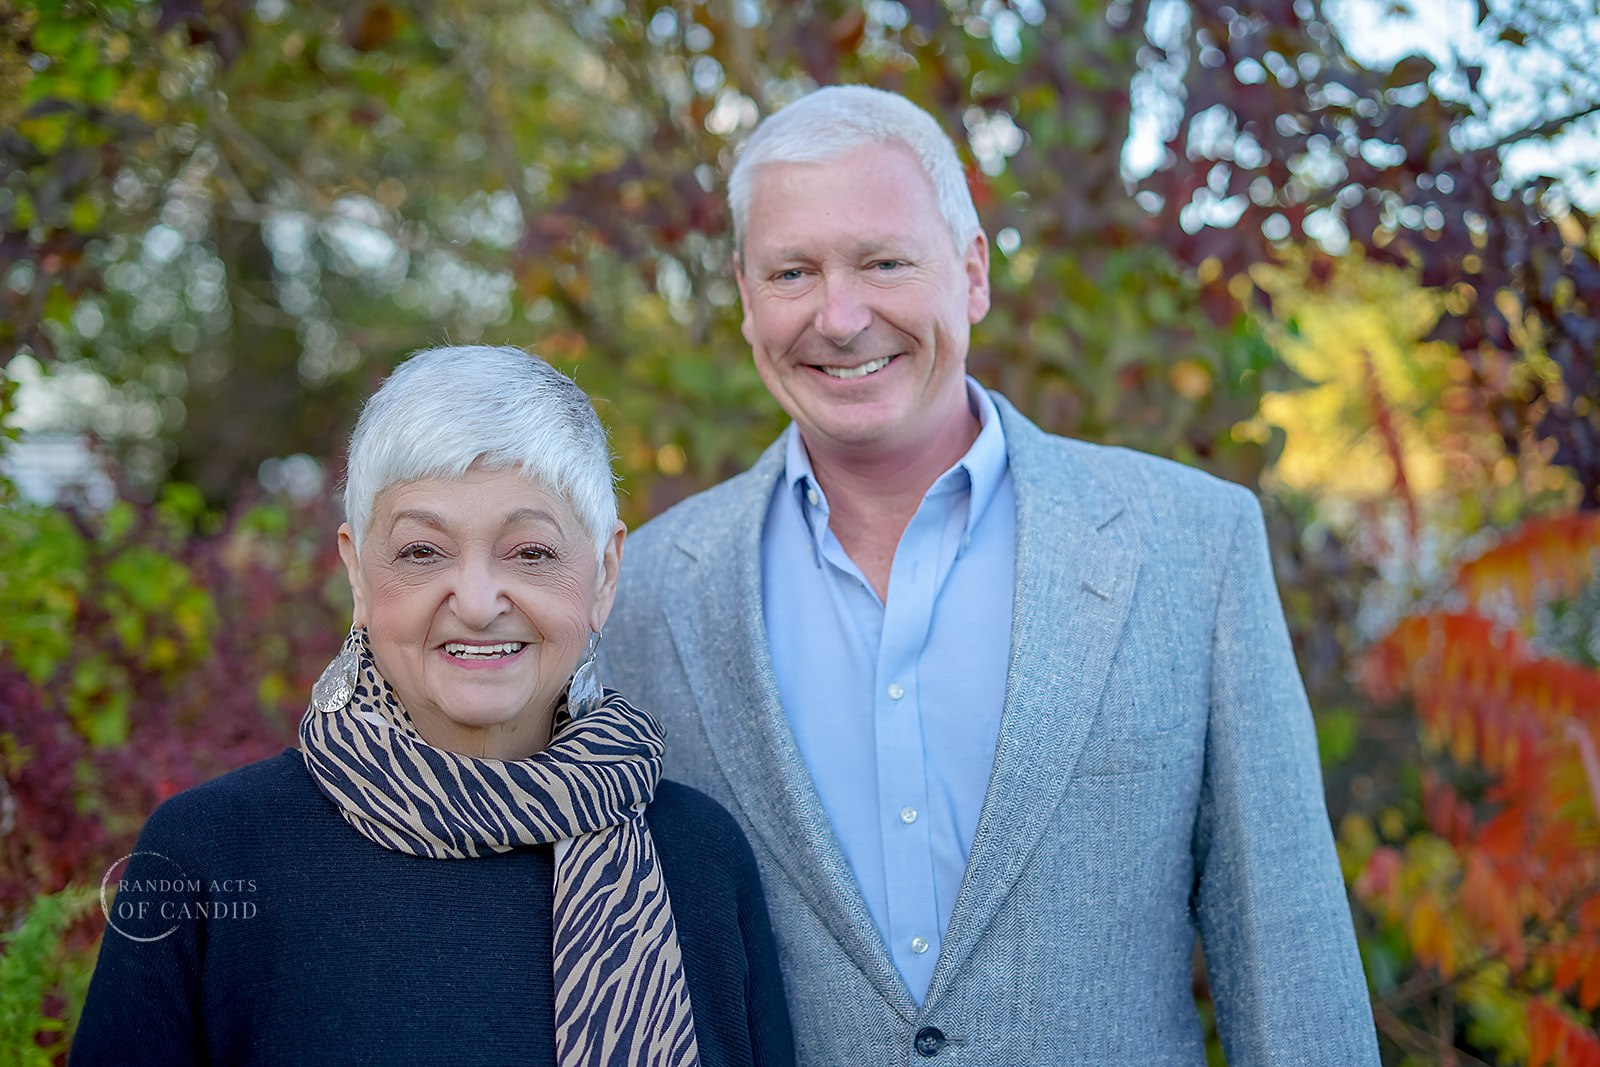 Patti Kemen and Steve Doherty